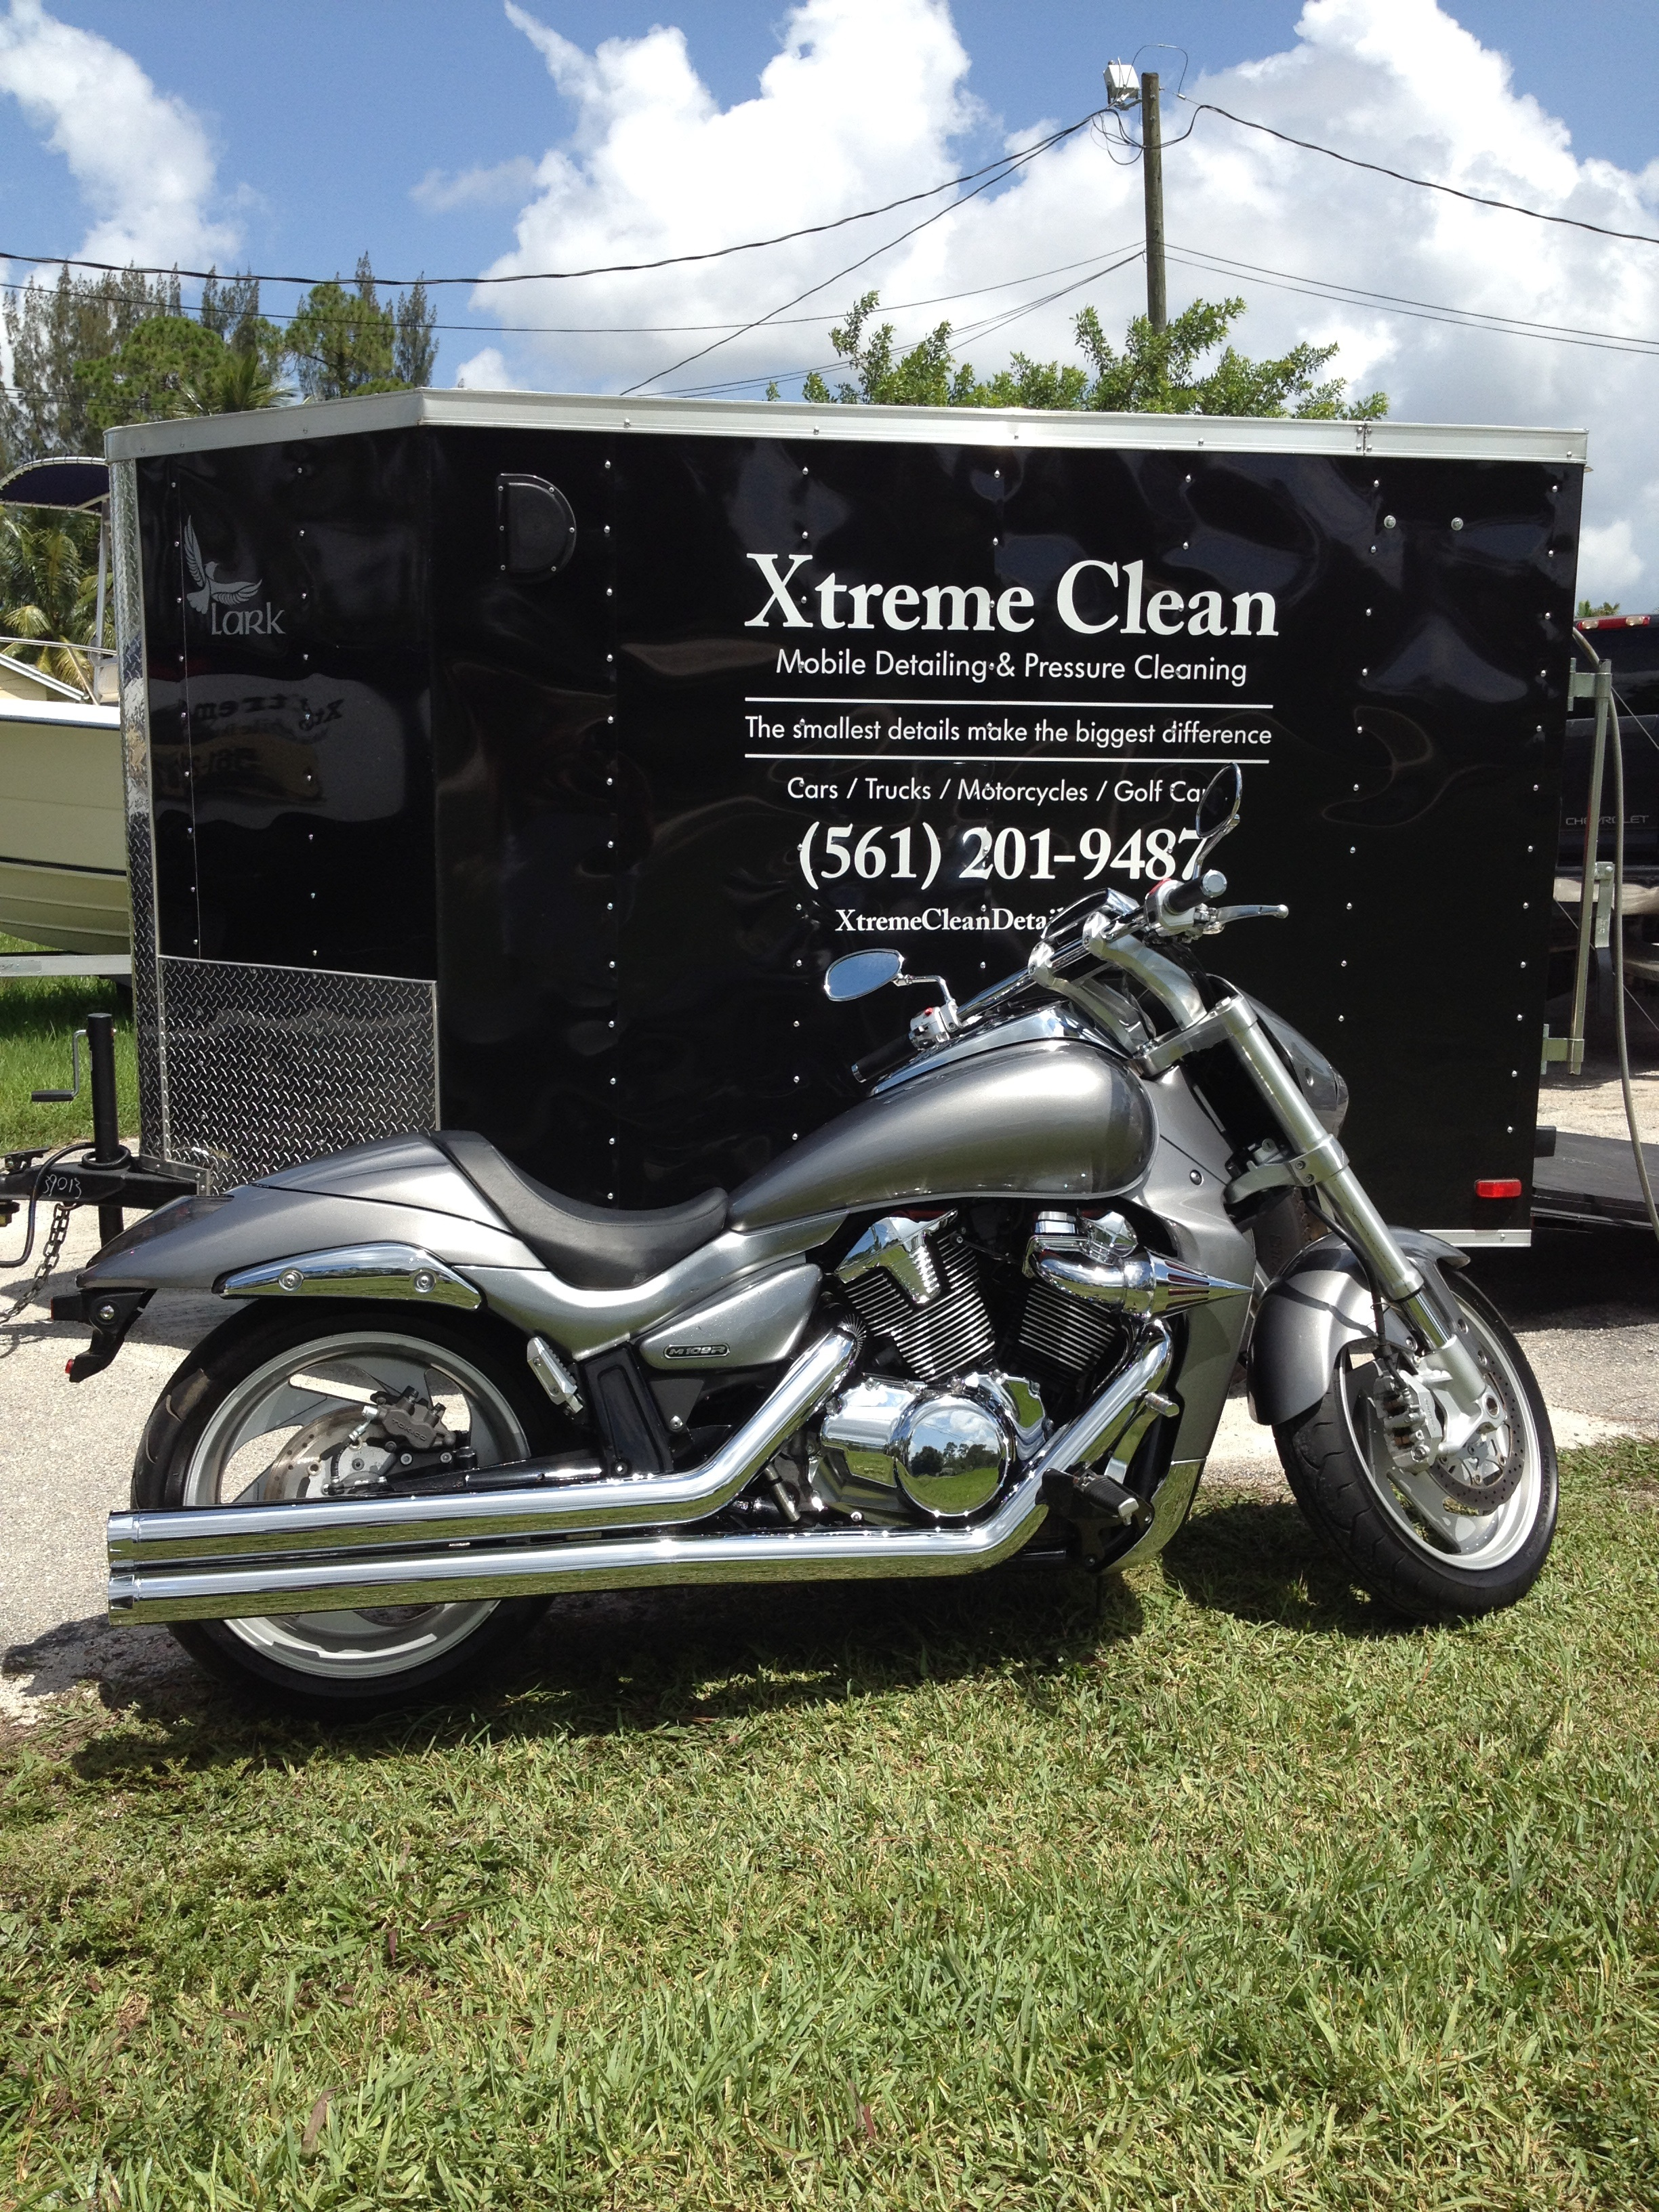 Xtreme Clean Detailing